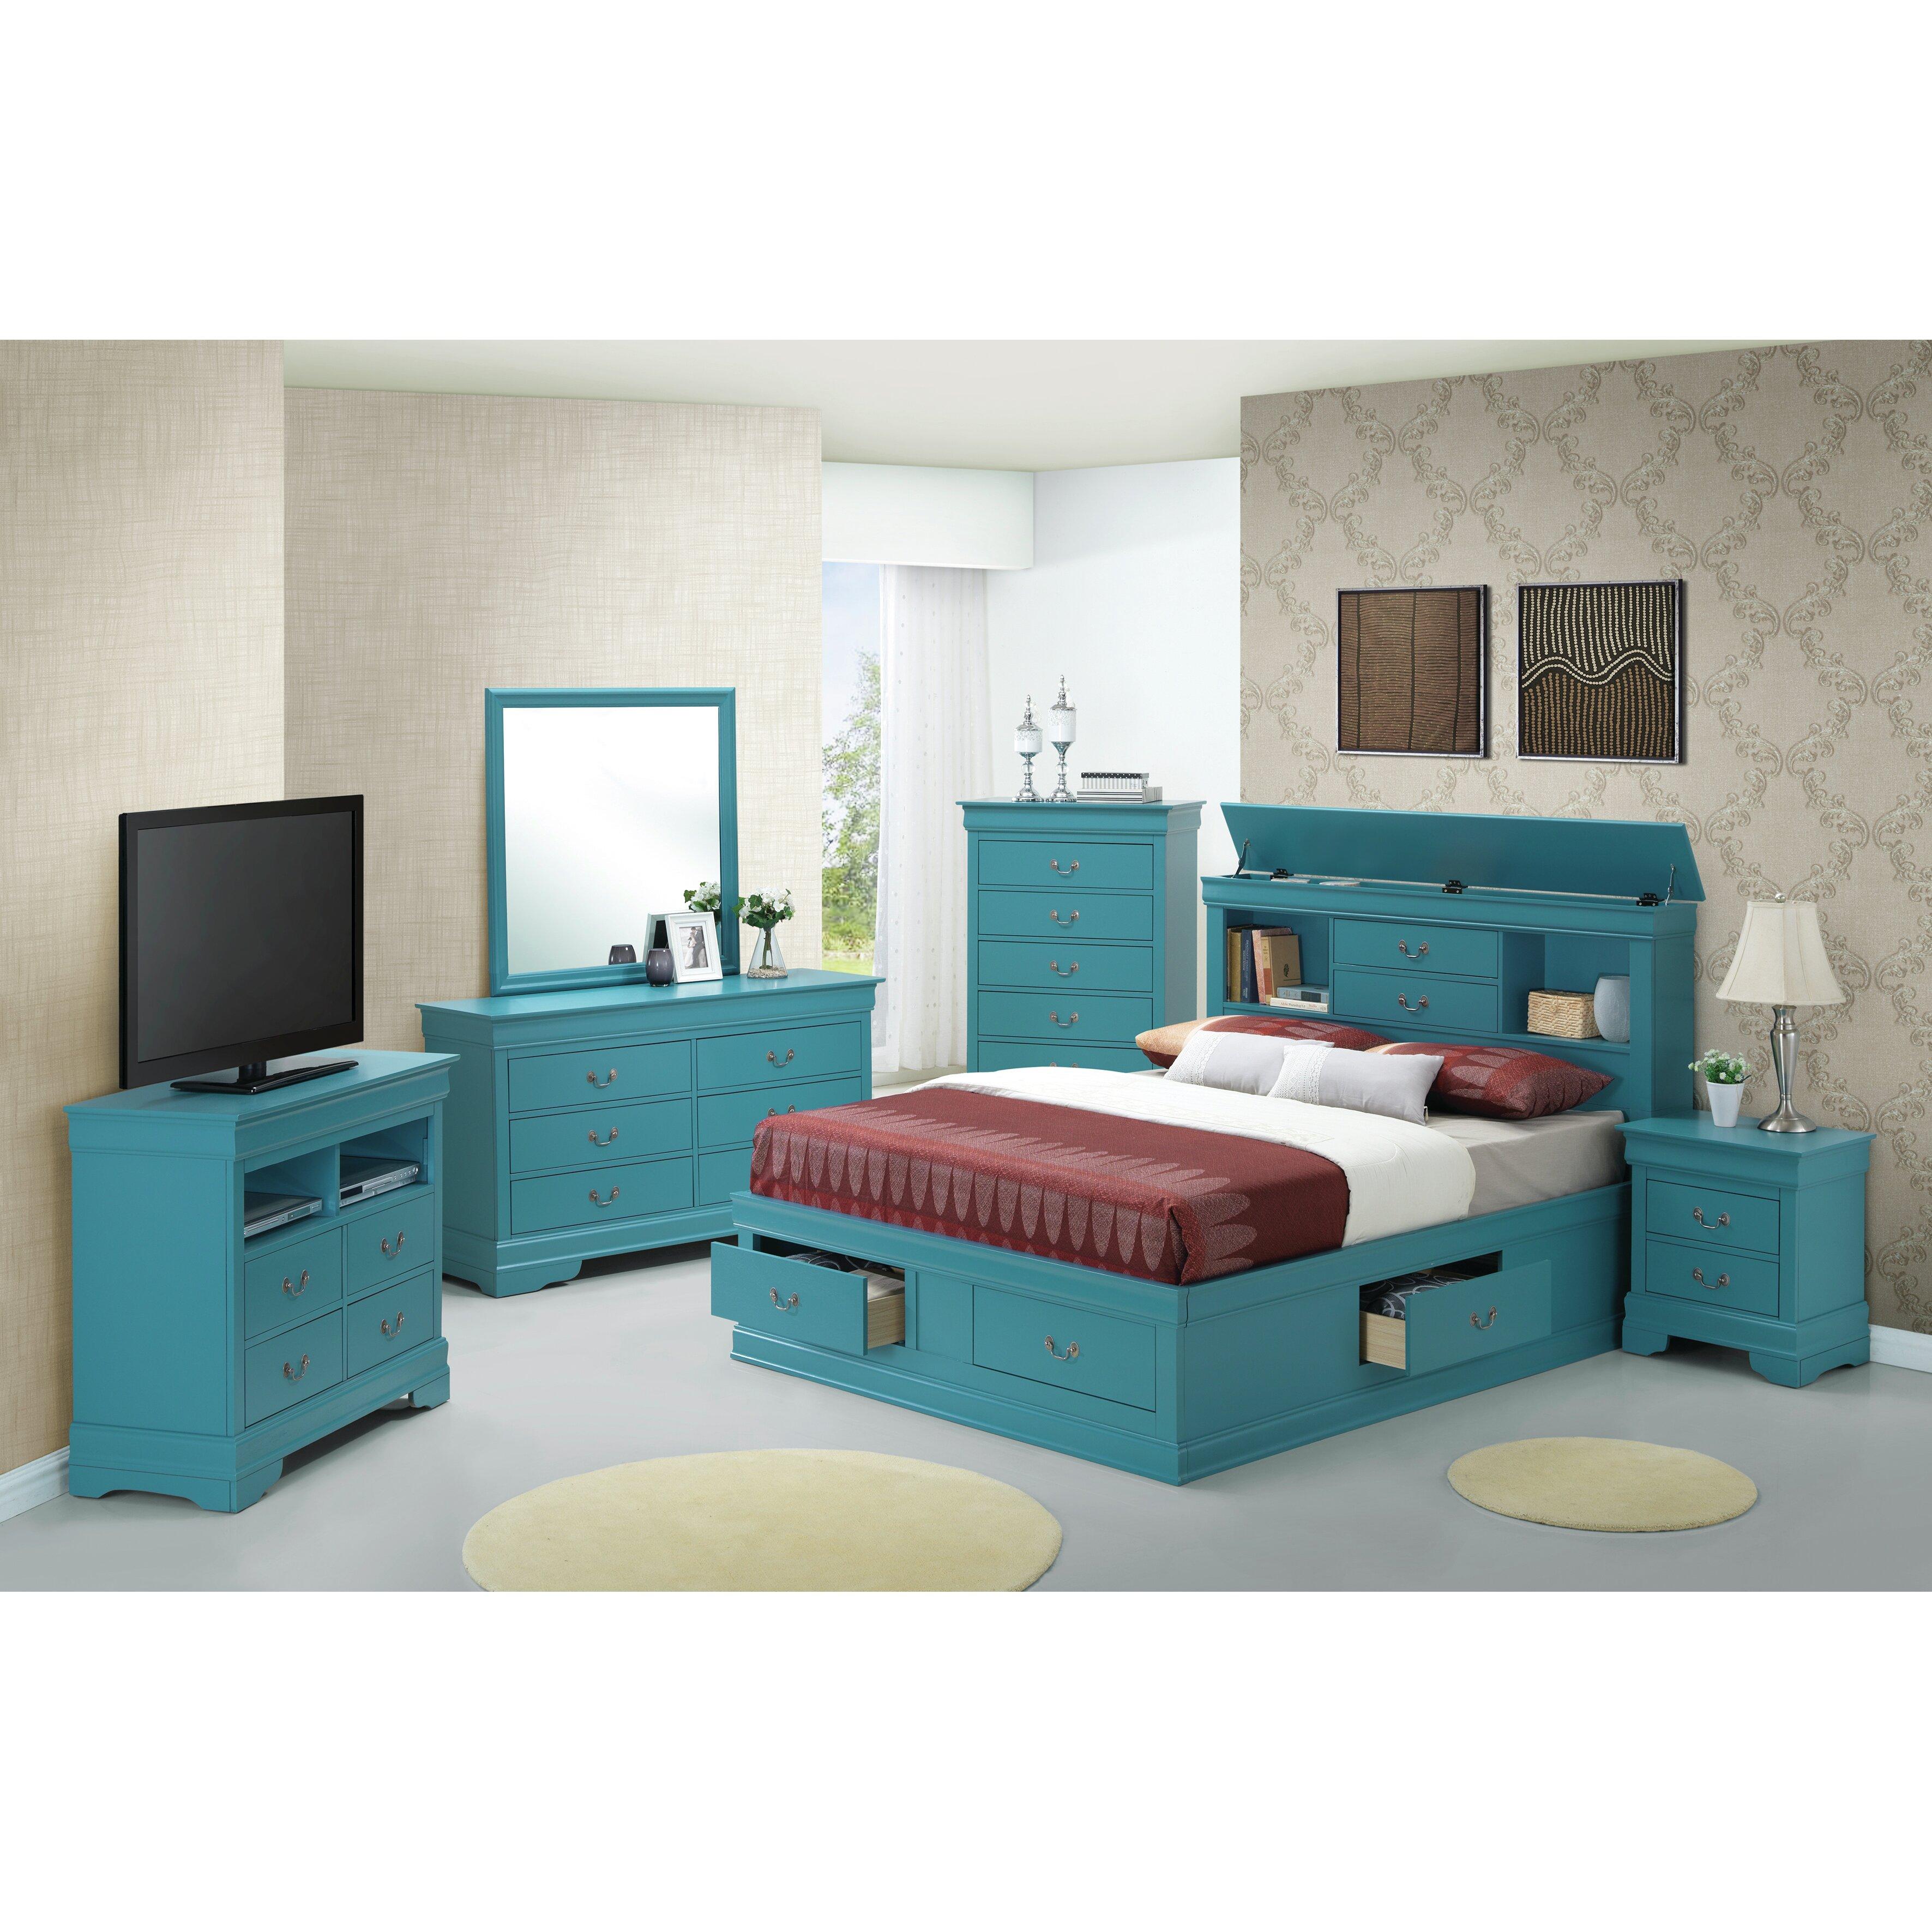 Stuff your stuff platform bed - Lark Manor Corbeil Platform Bed Stuff Your Stuff Platform Bed